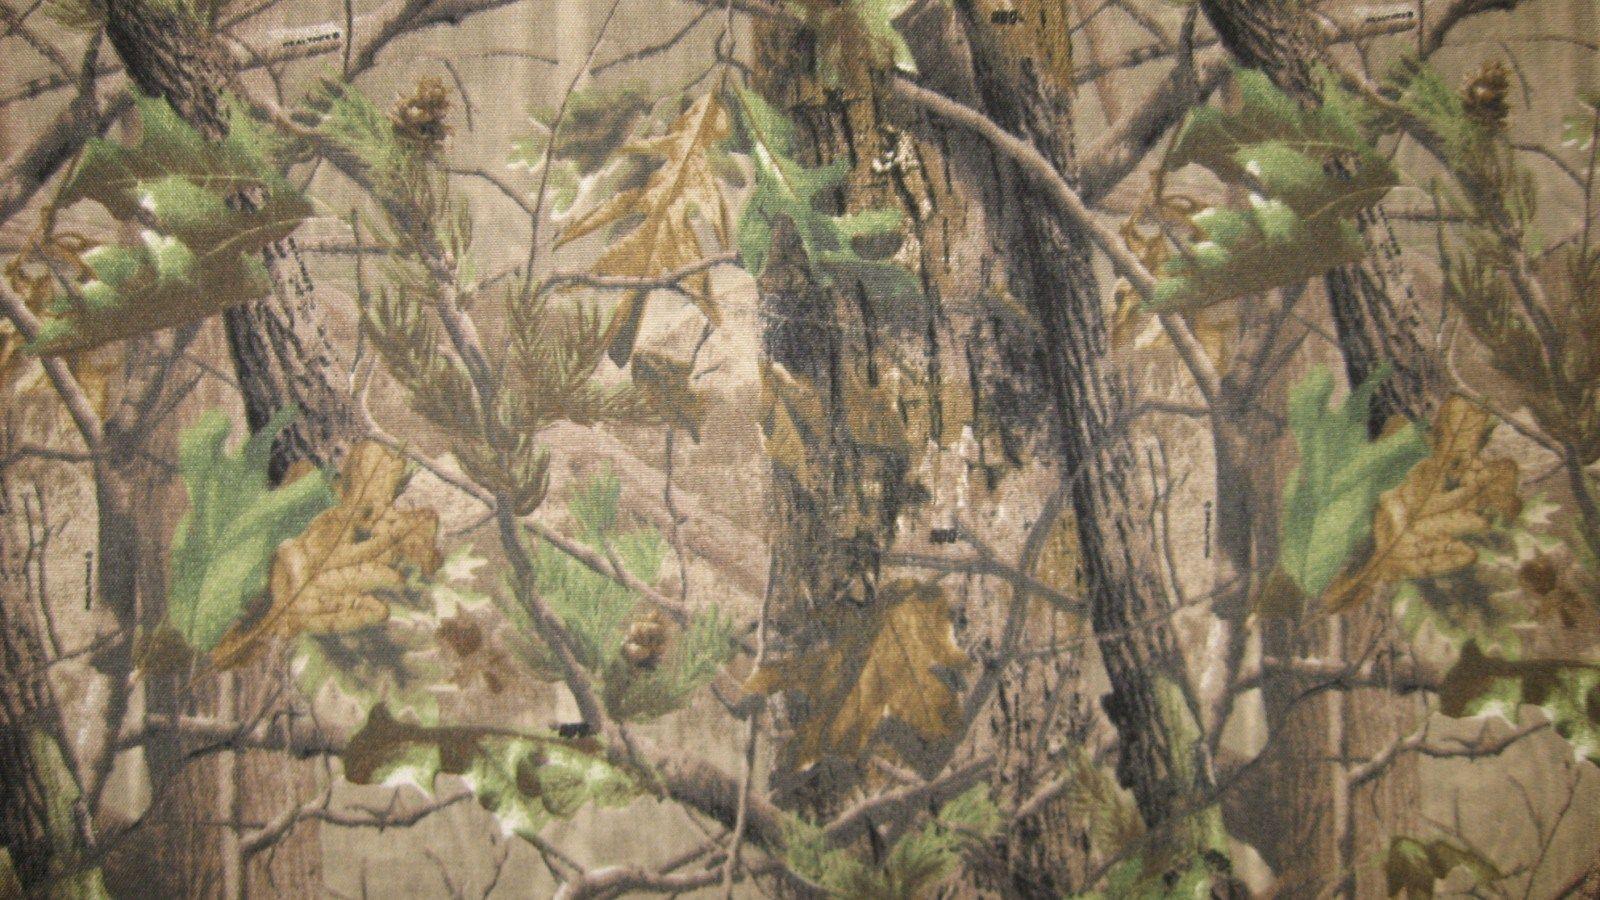 Realtree Camo Wallpapers - Wallpaper Cave